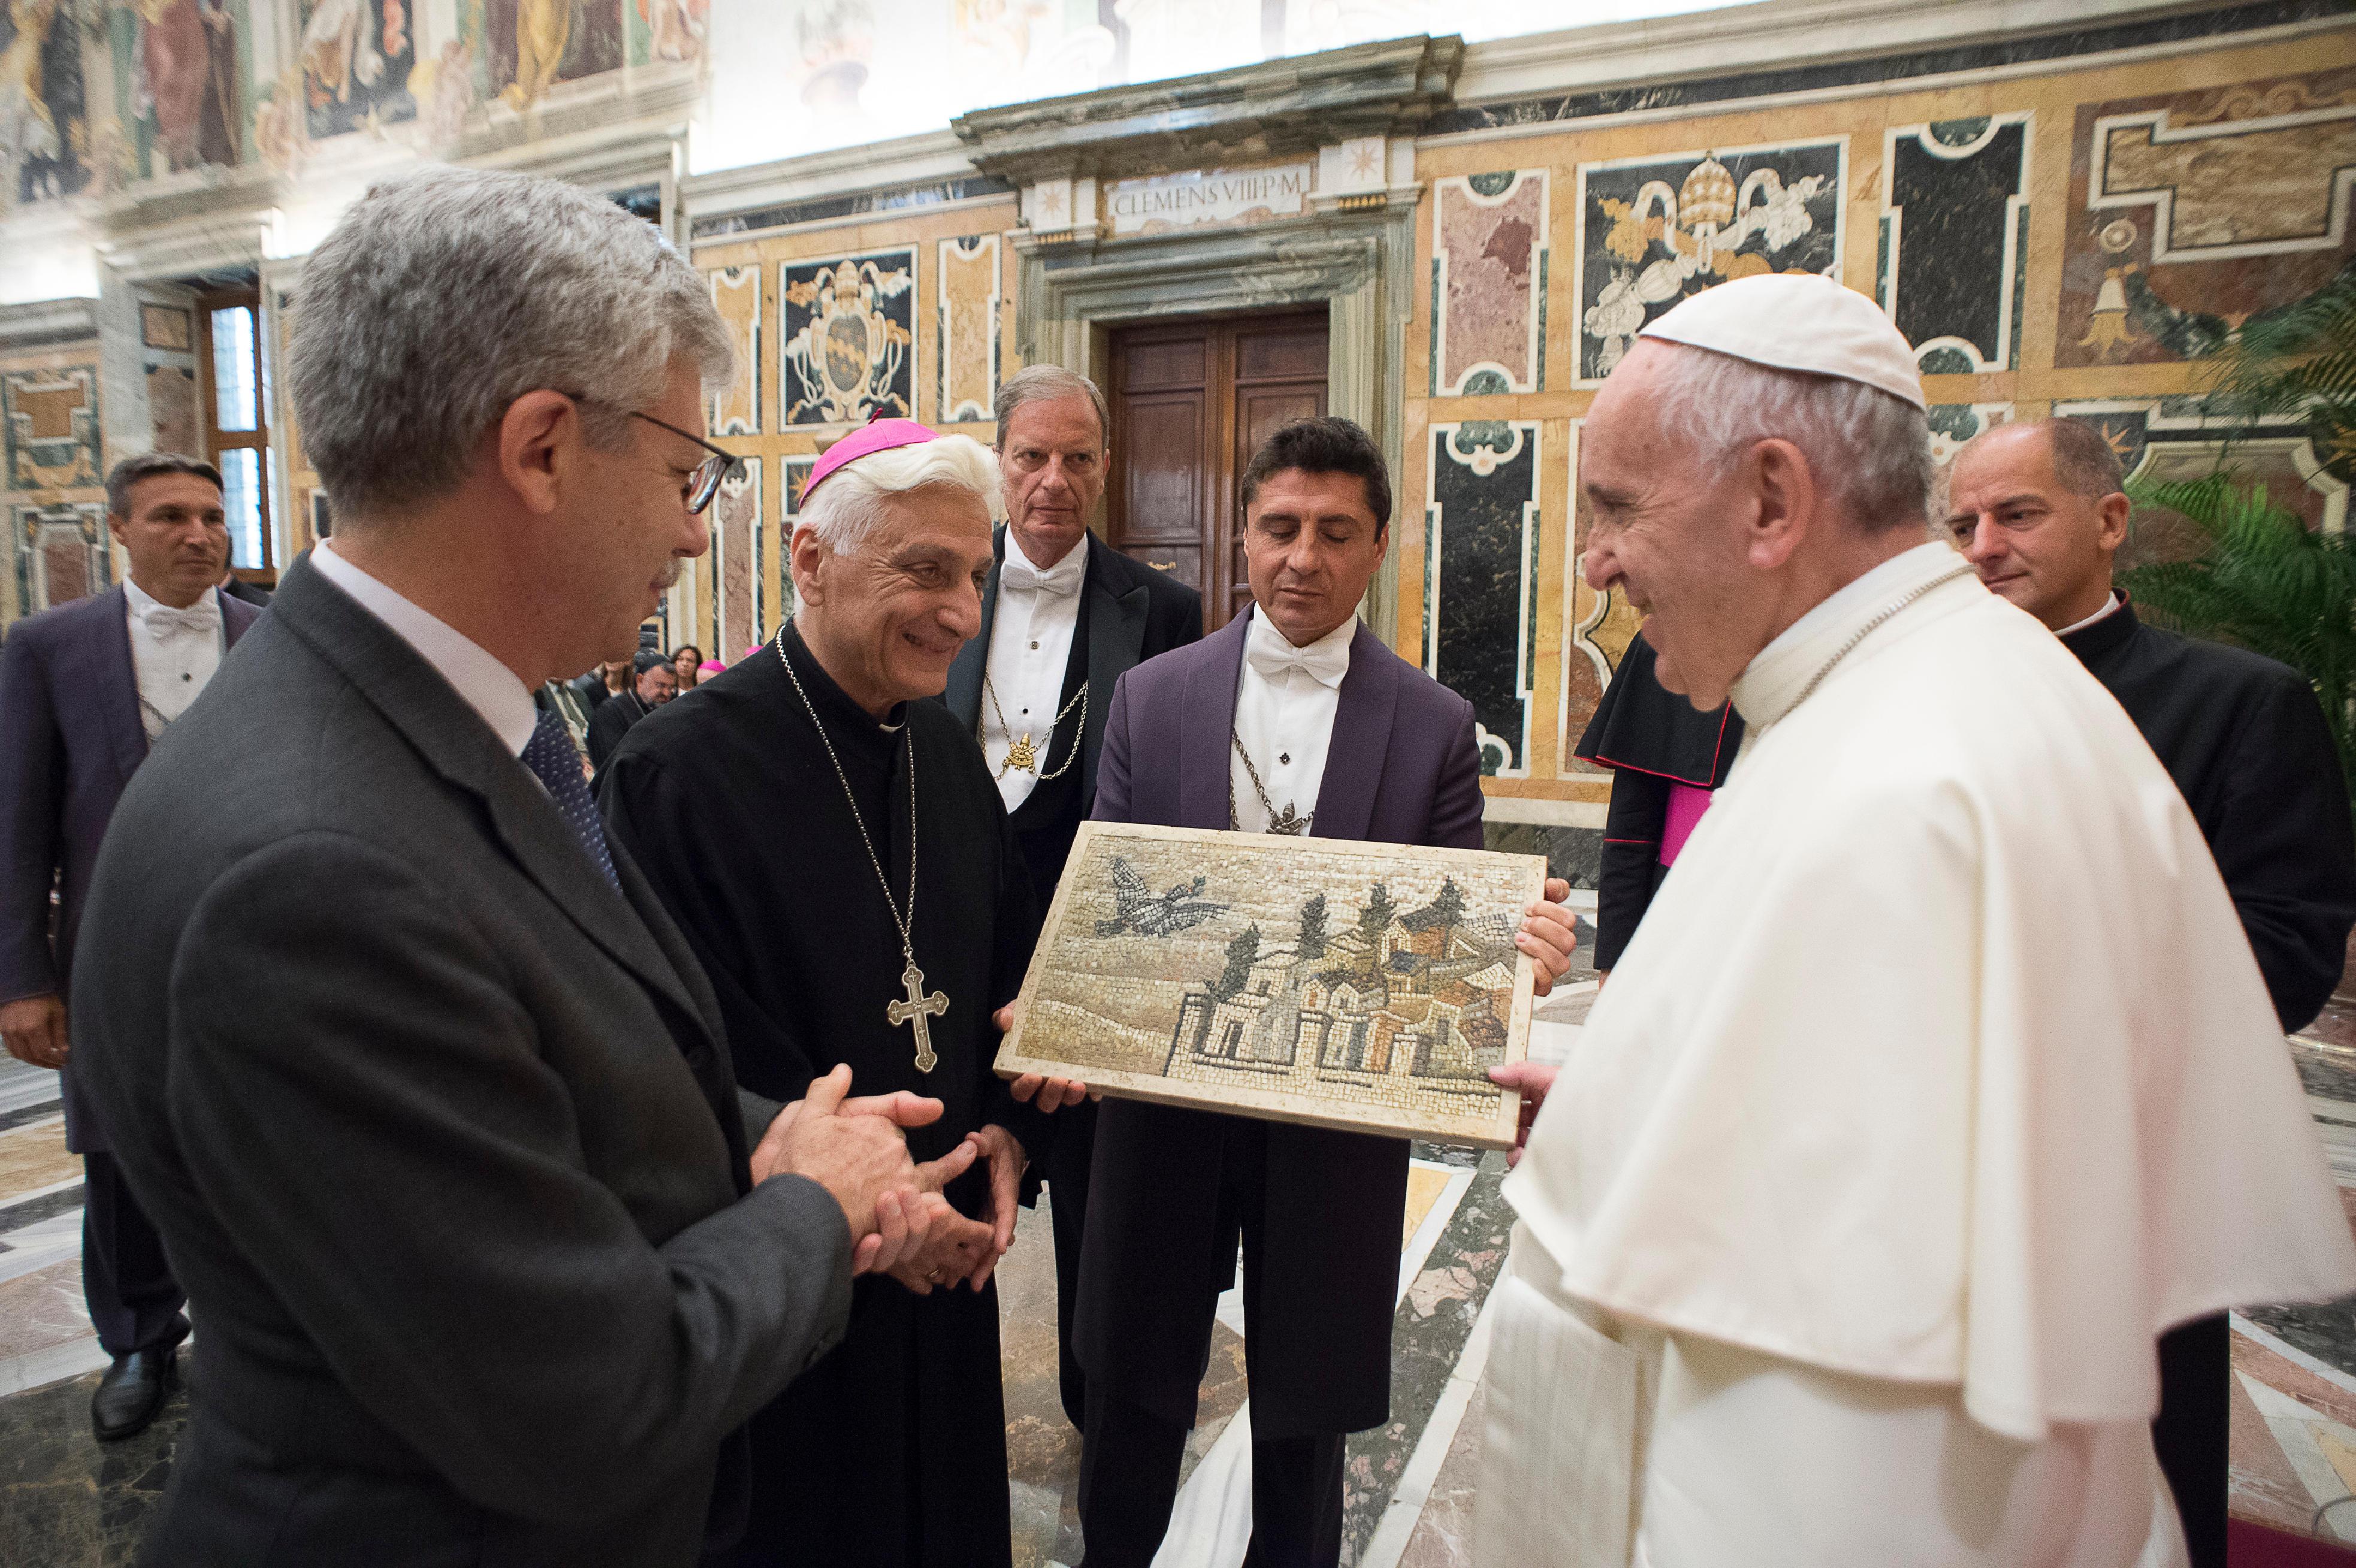 Mgr Audo SJ, audience organismes caritatifs en Syrie et Irak © L'Osservatore Romano